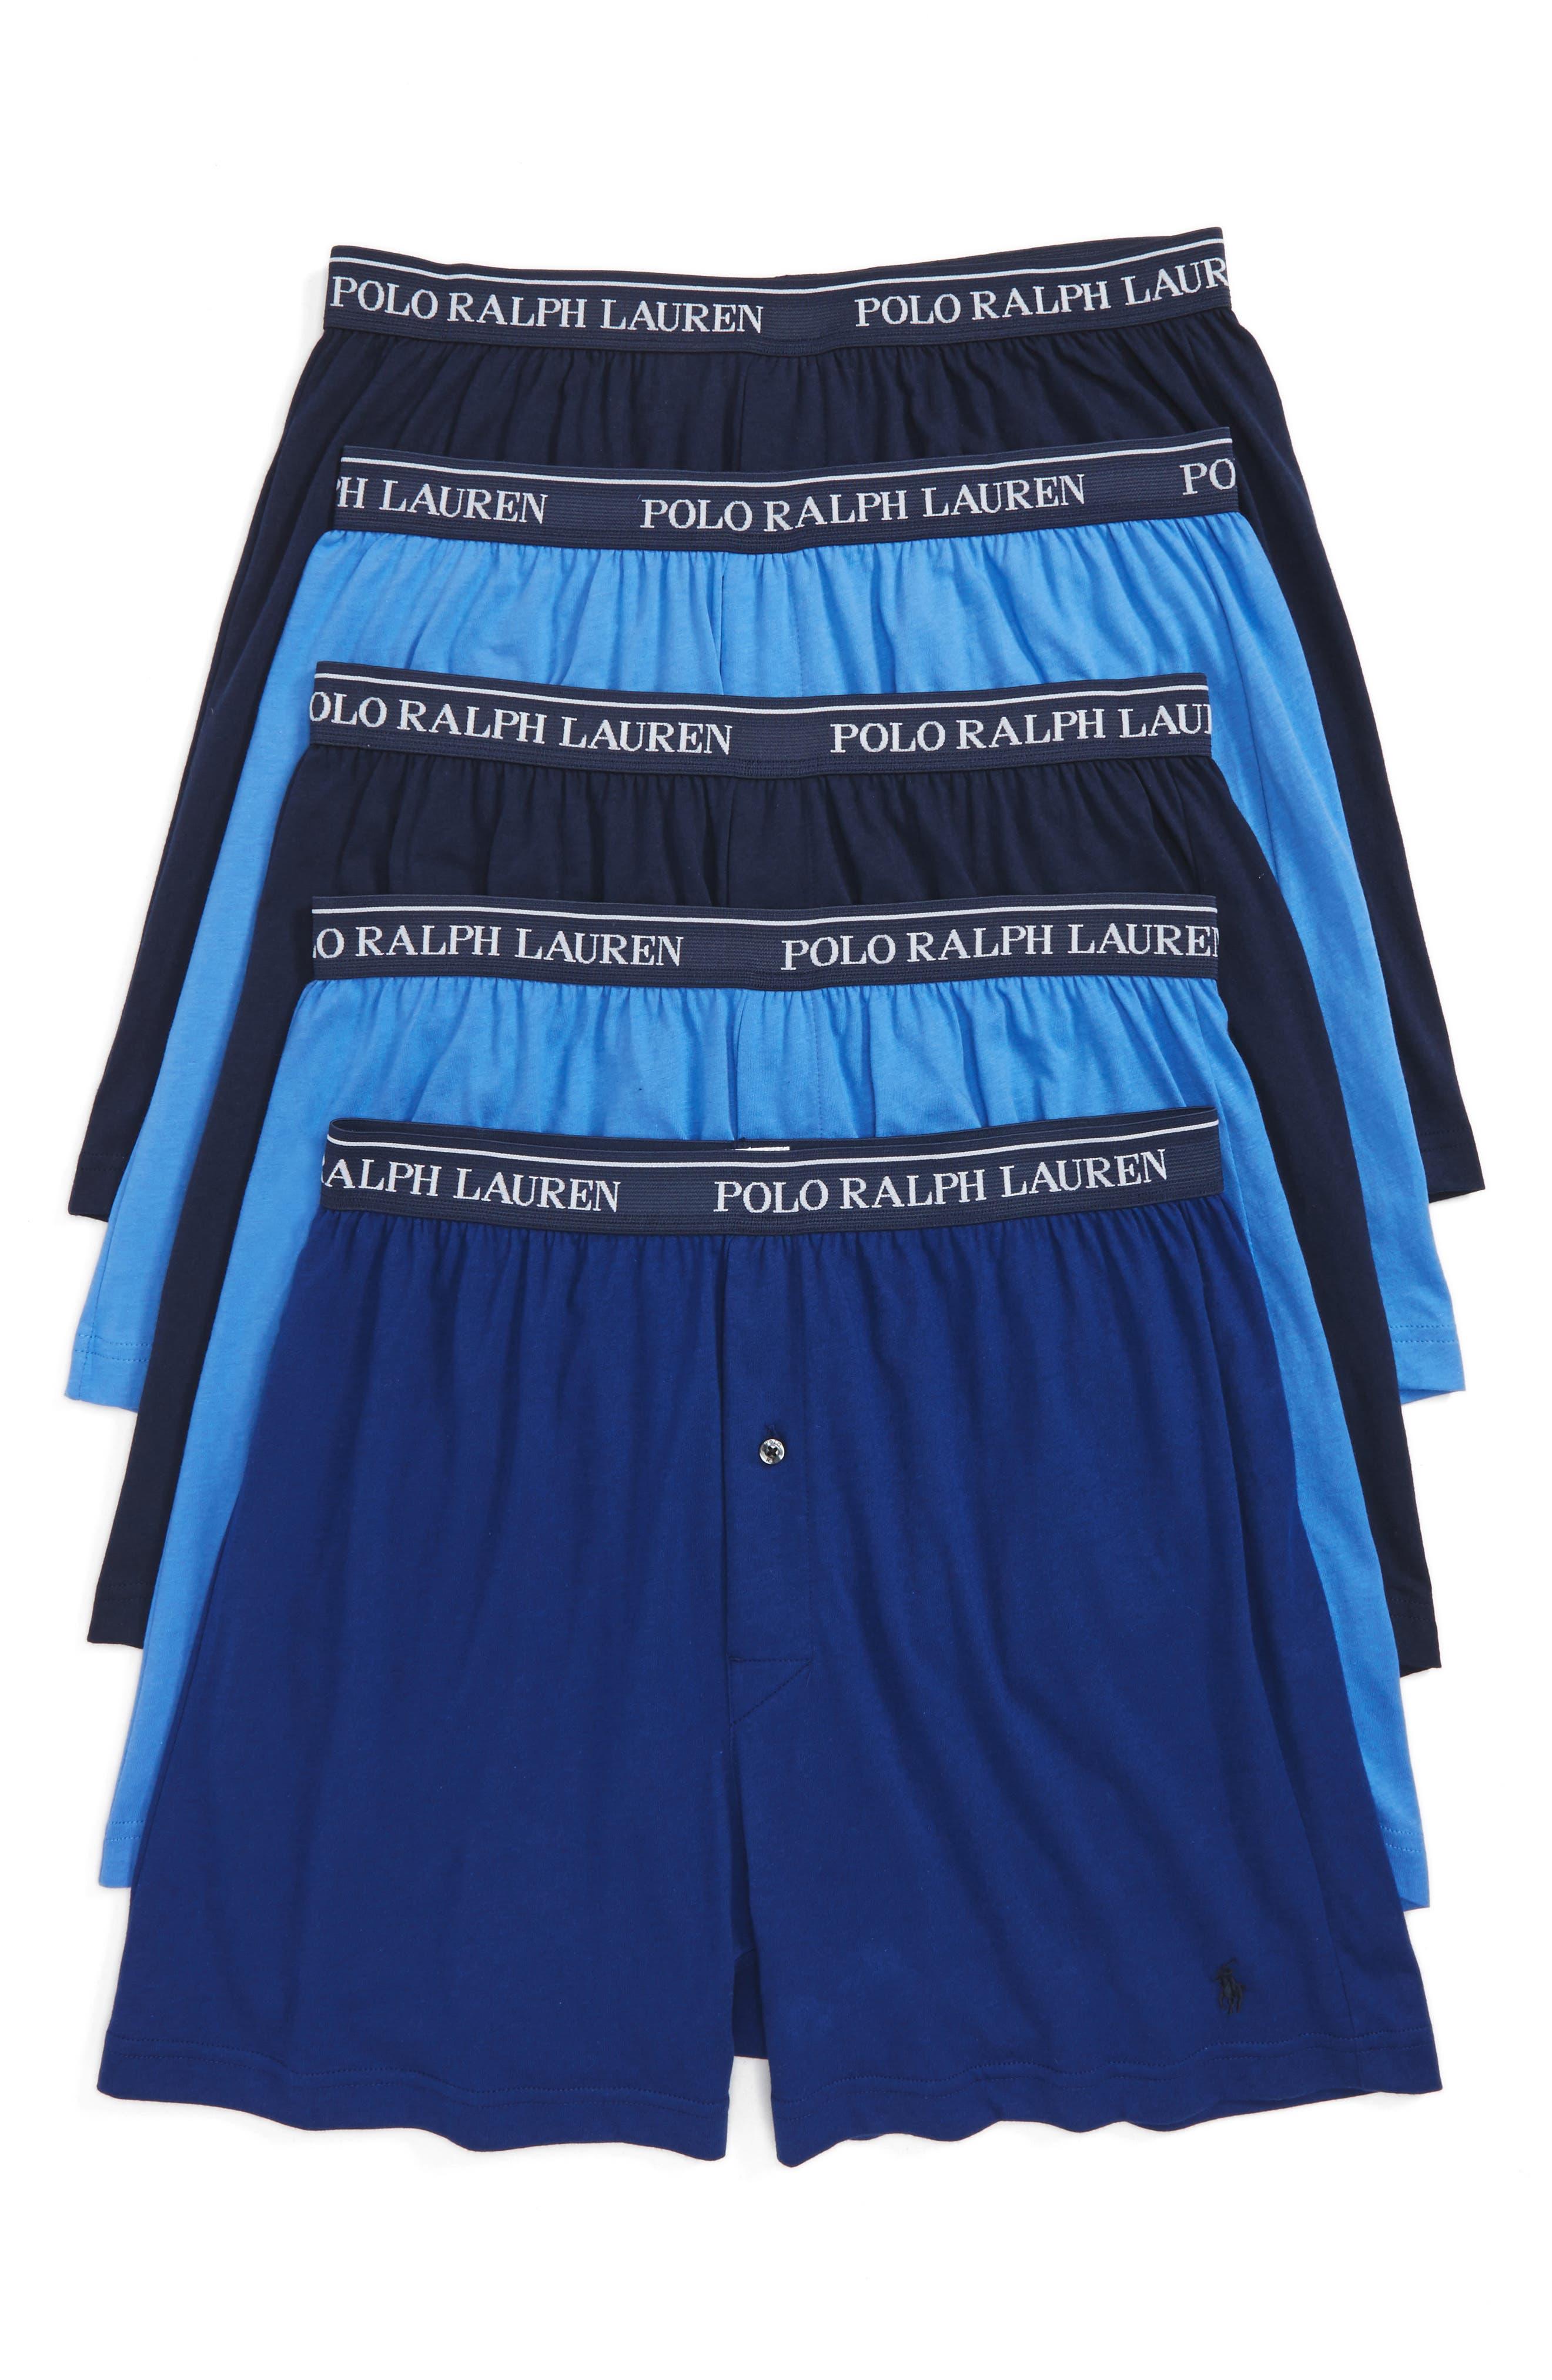 5-Pack Cotton Boxers,                             Main thumbnail 1, color,                             BLUE/ ROYAL BLUE/ NAVY